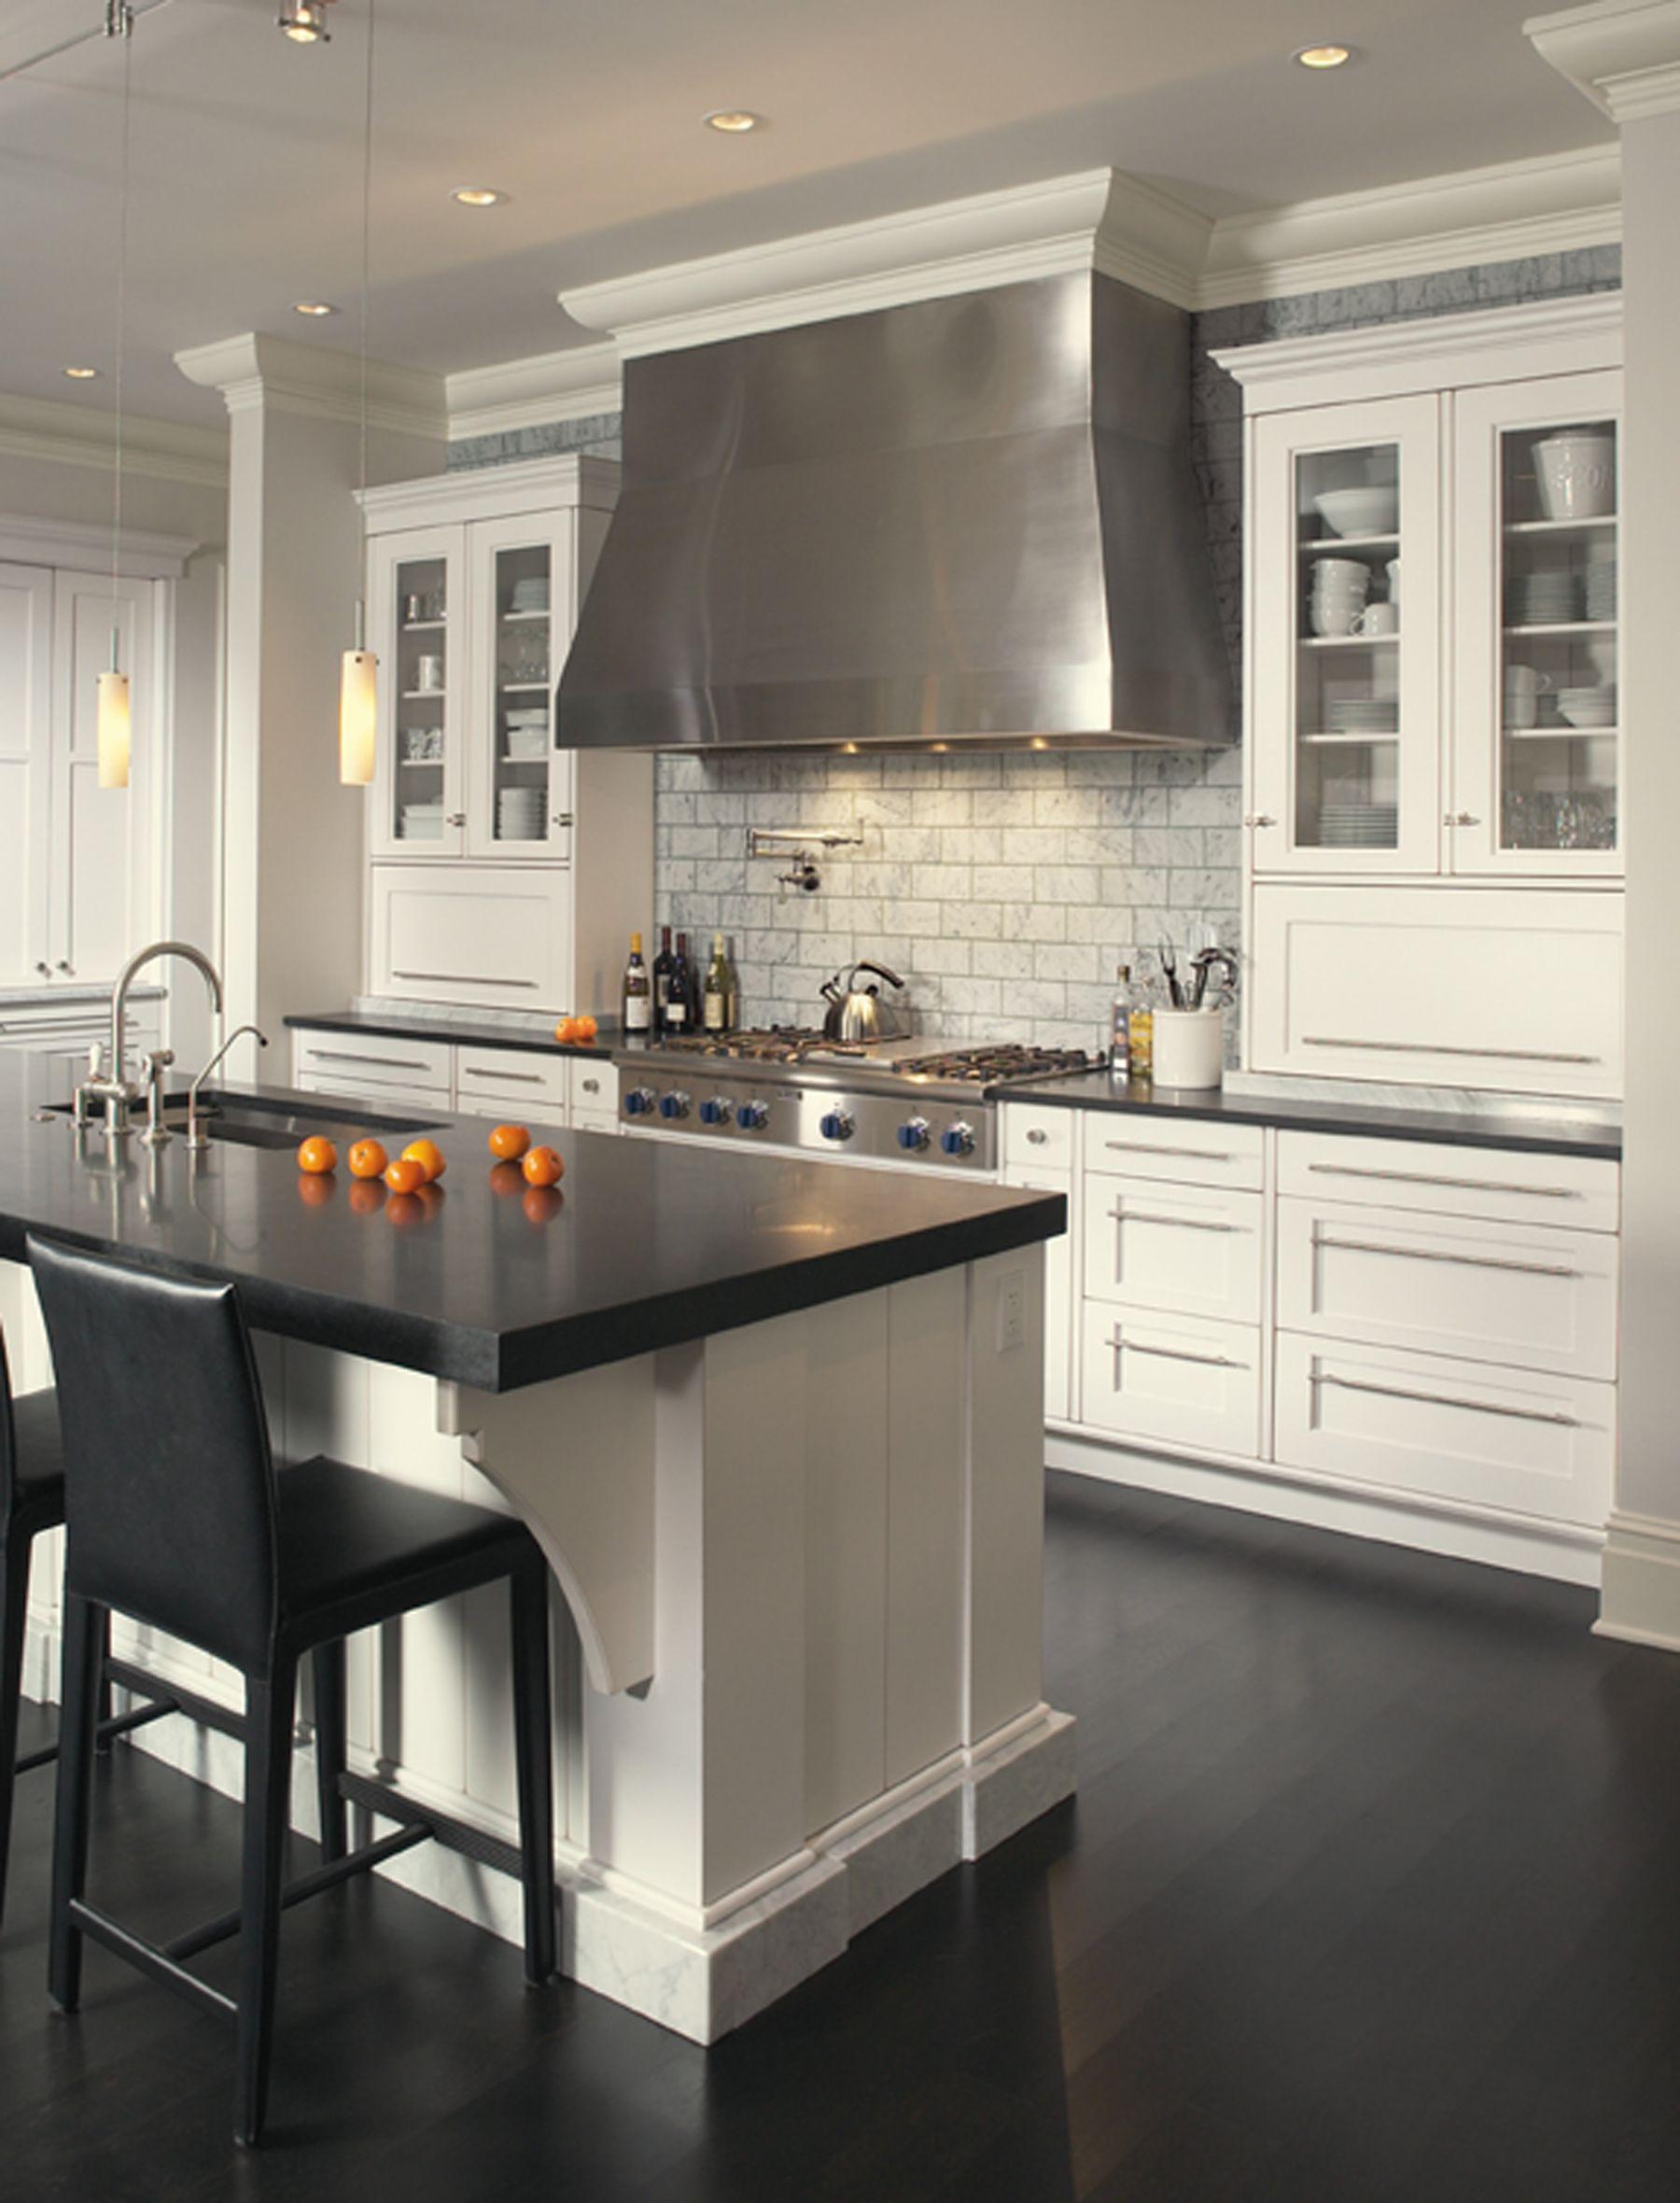 Kitchen Design by Rob Klein of Conceptual Kitchens